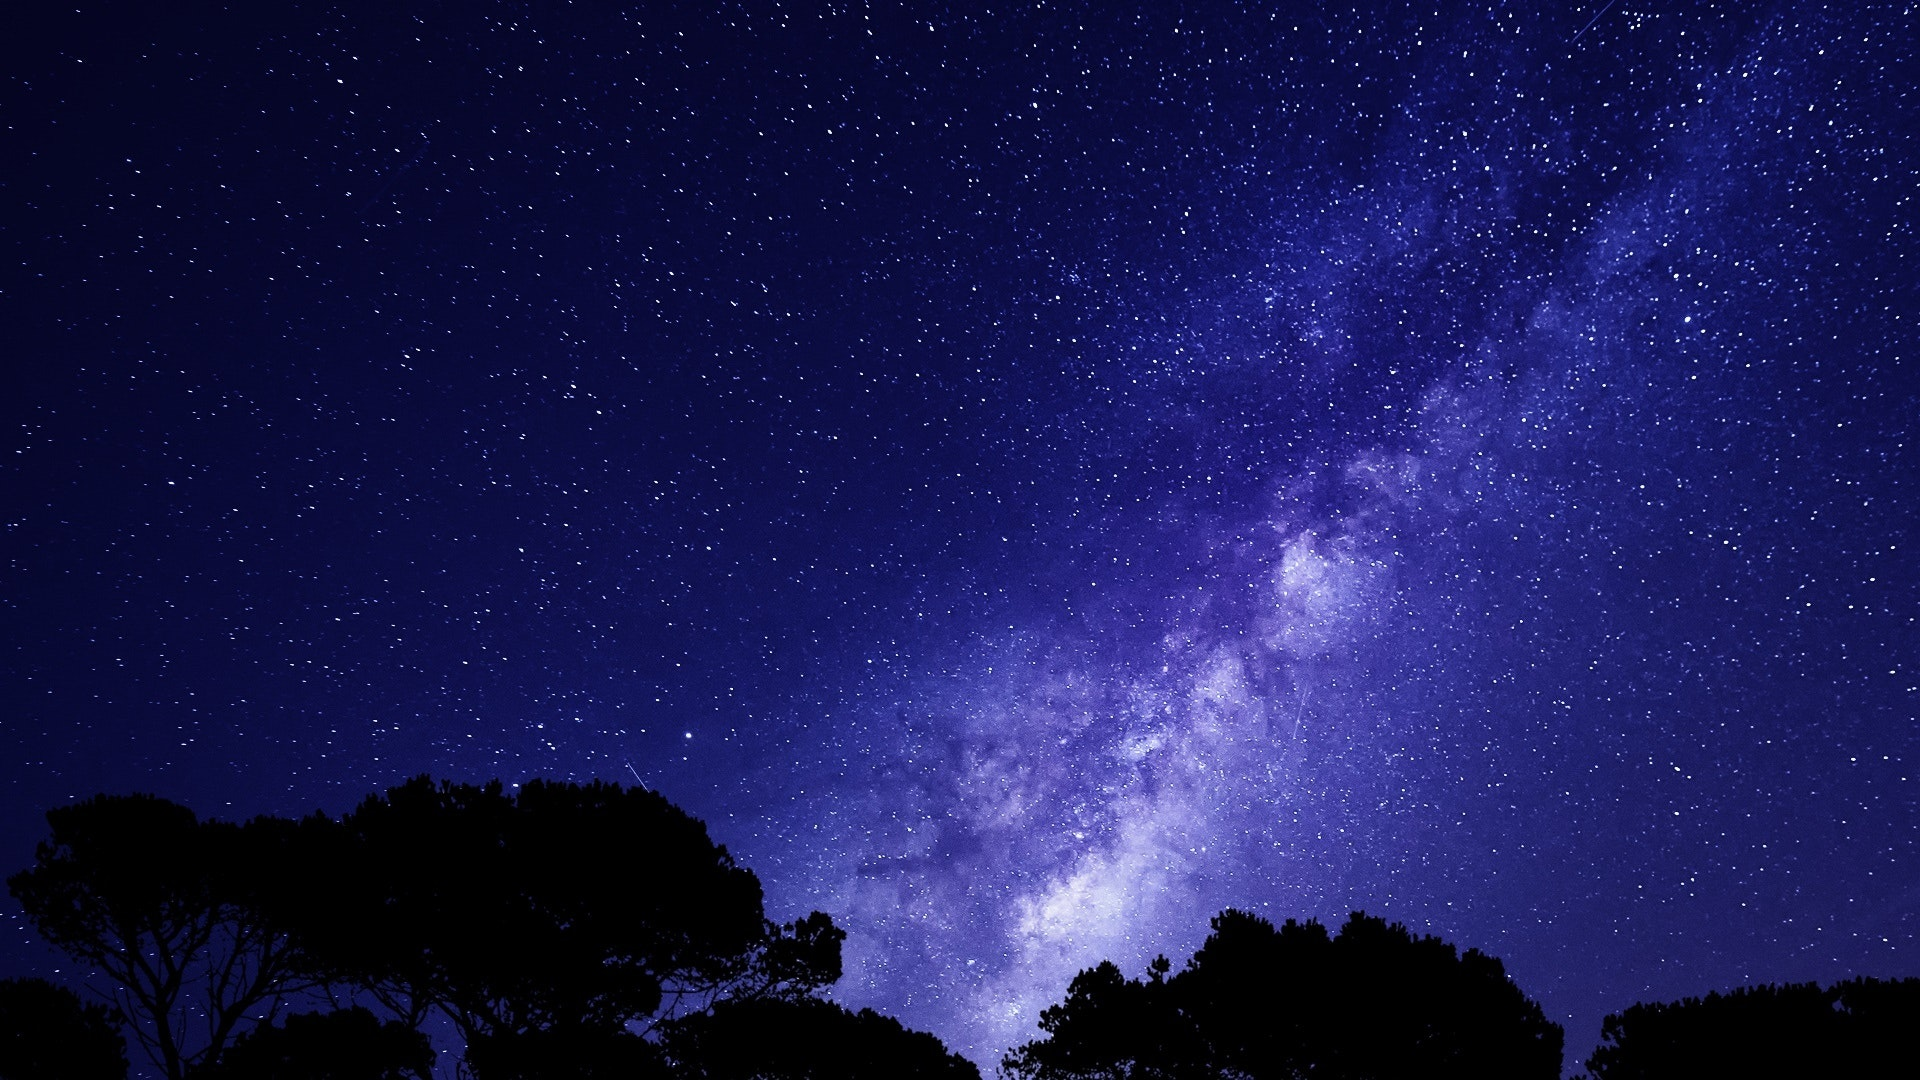 Night Sky Wallpaper by uk